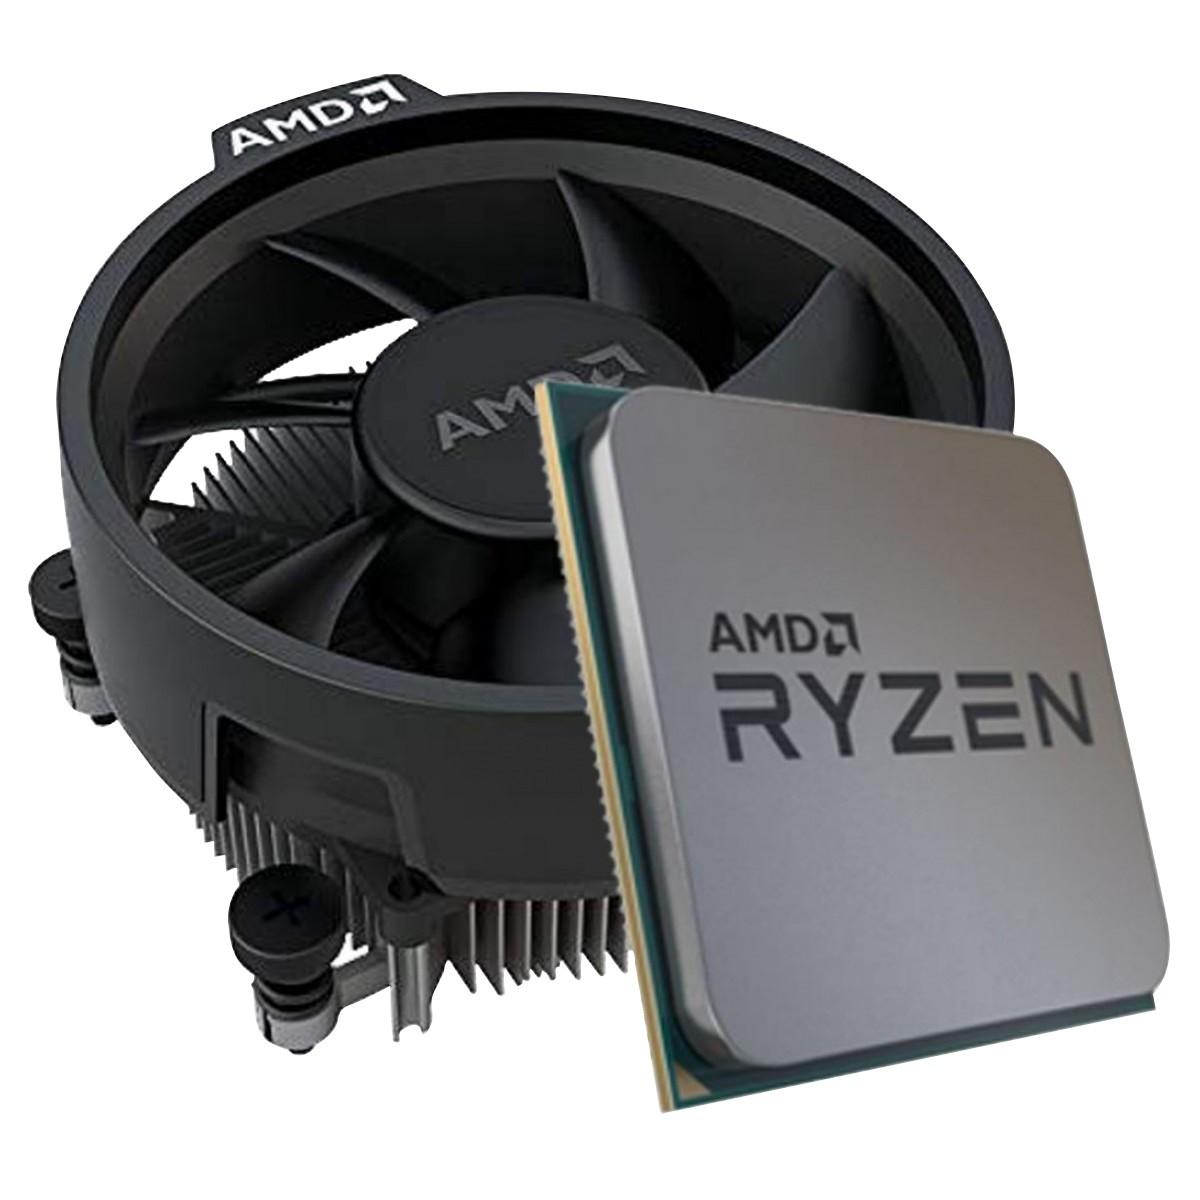 Kit Upgrade, Asus Prime B450M Gaming/BR + Ryzen 3 4300GE + Memória DDR4 16GB/3000MHz